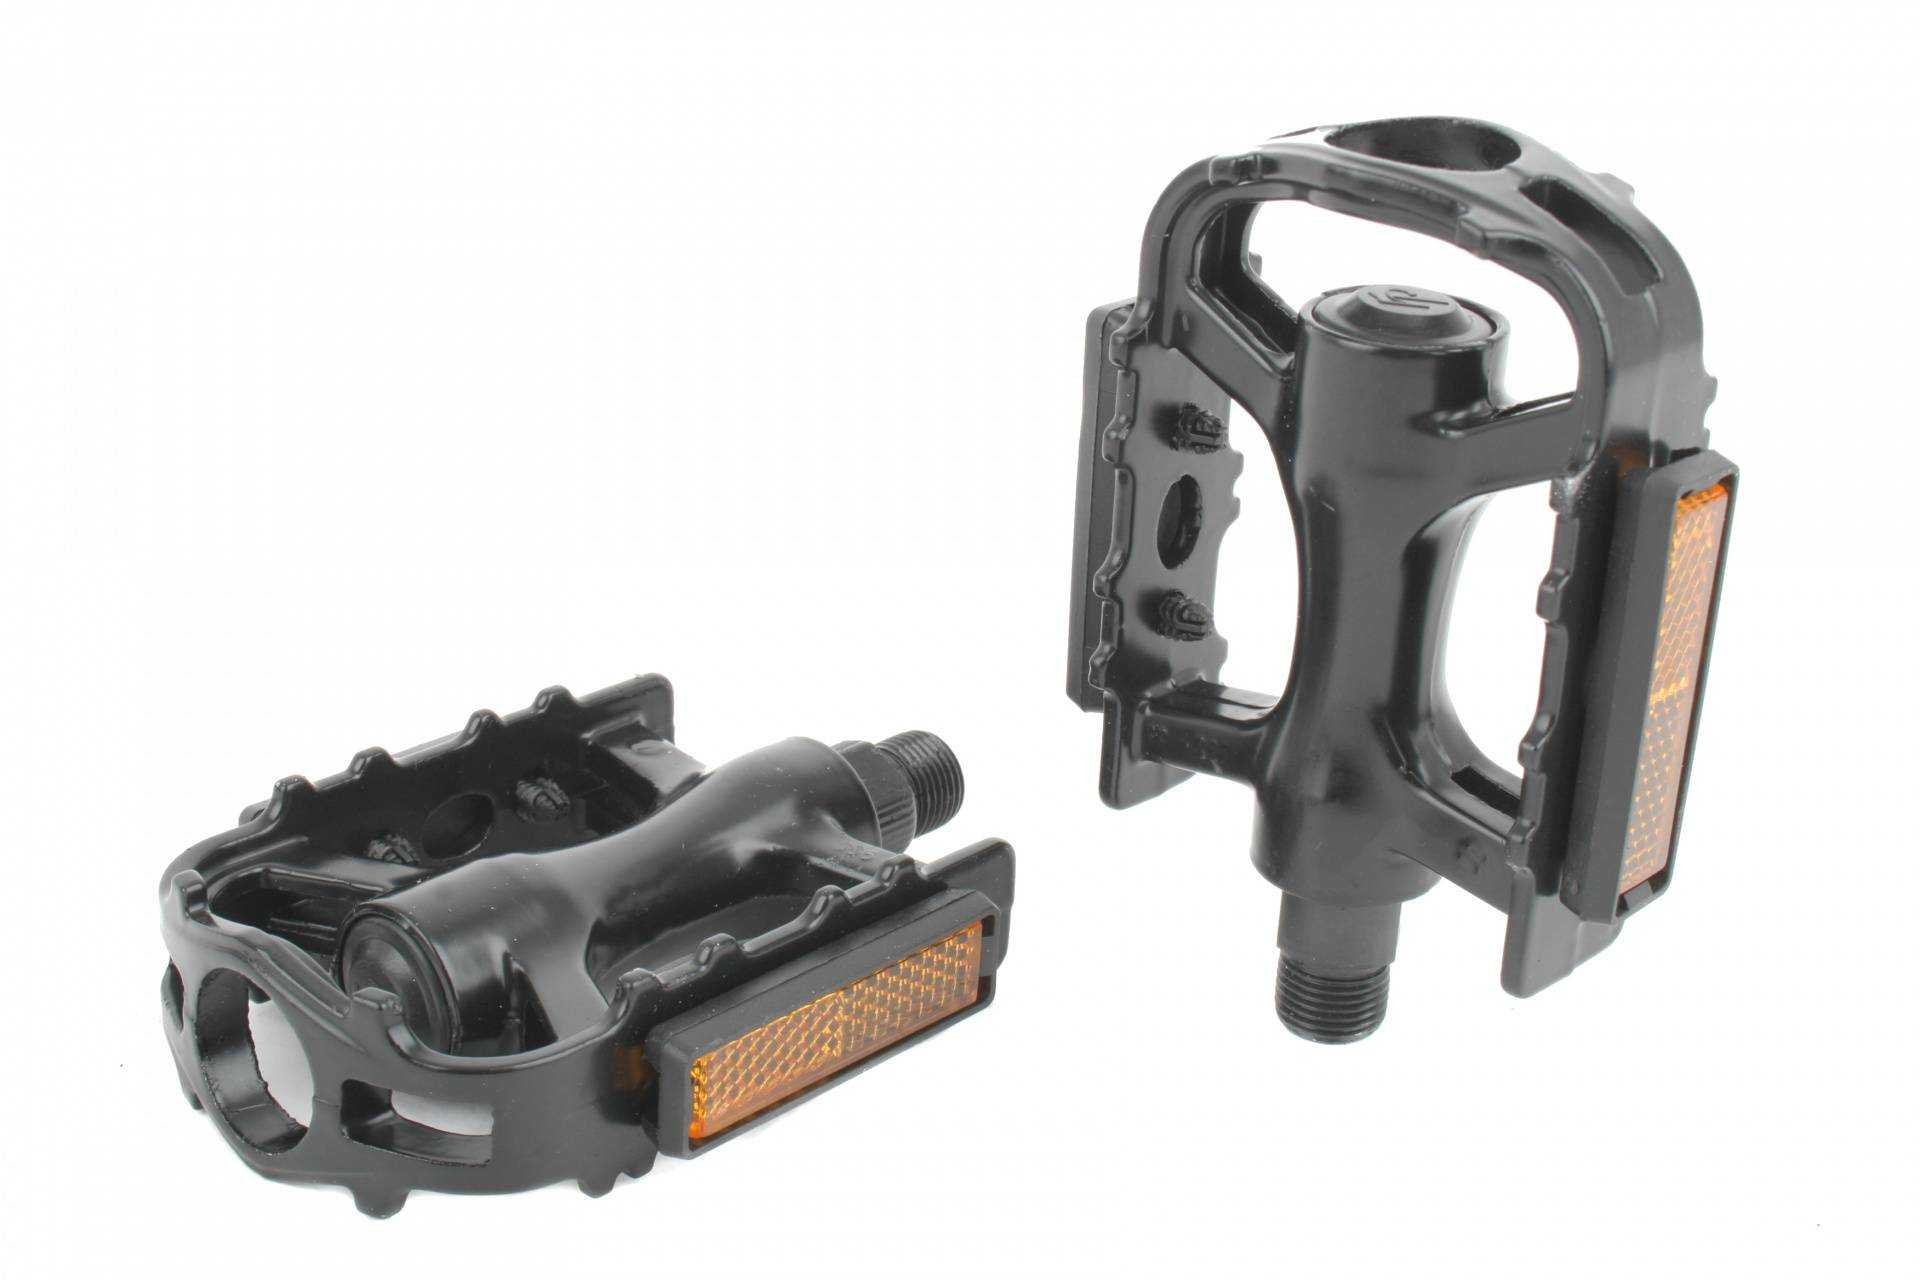 Педали, (комплект), FEIMIN, FP-960, RPEFP9600001